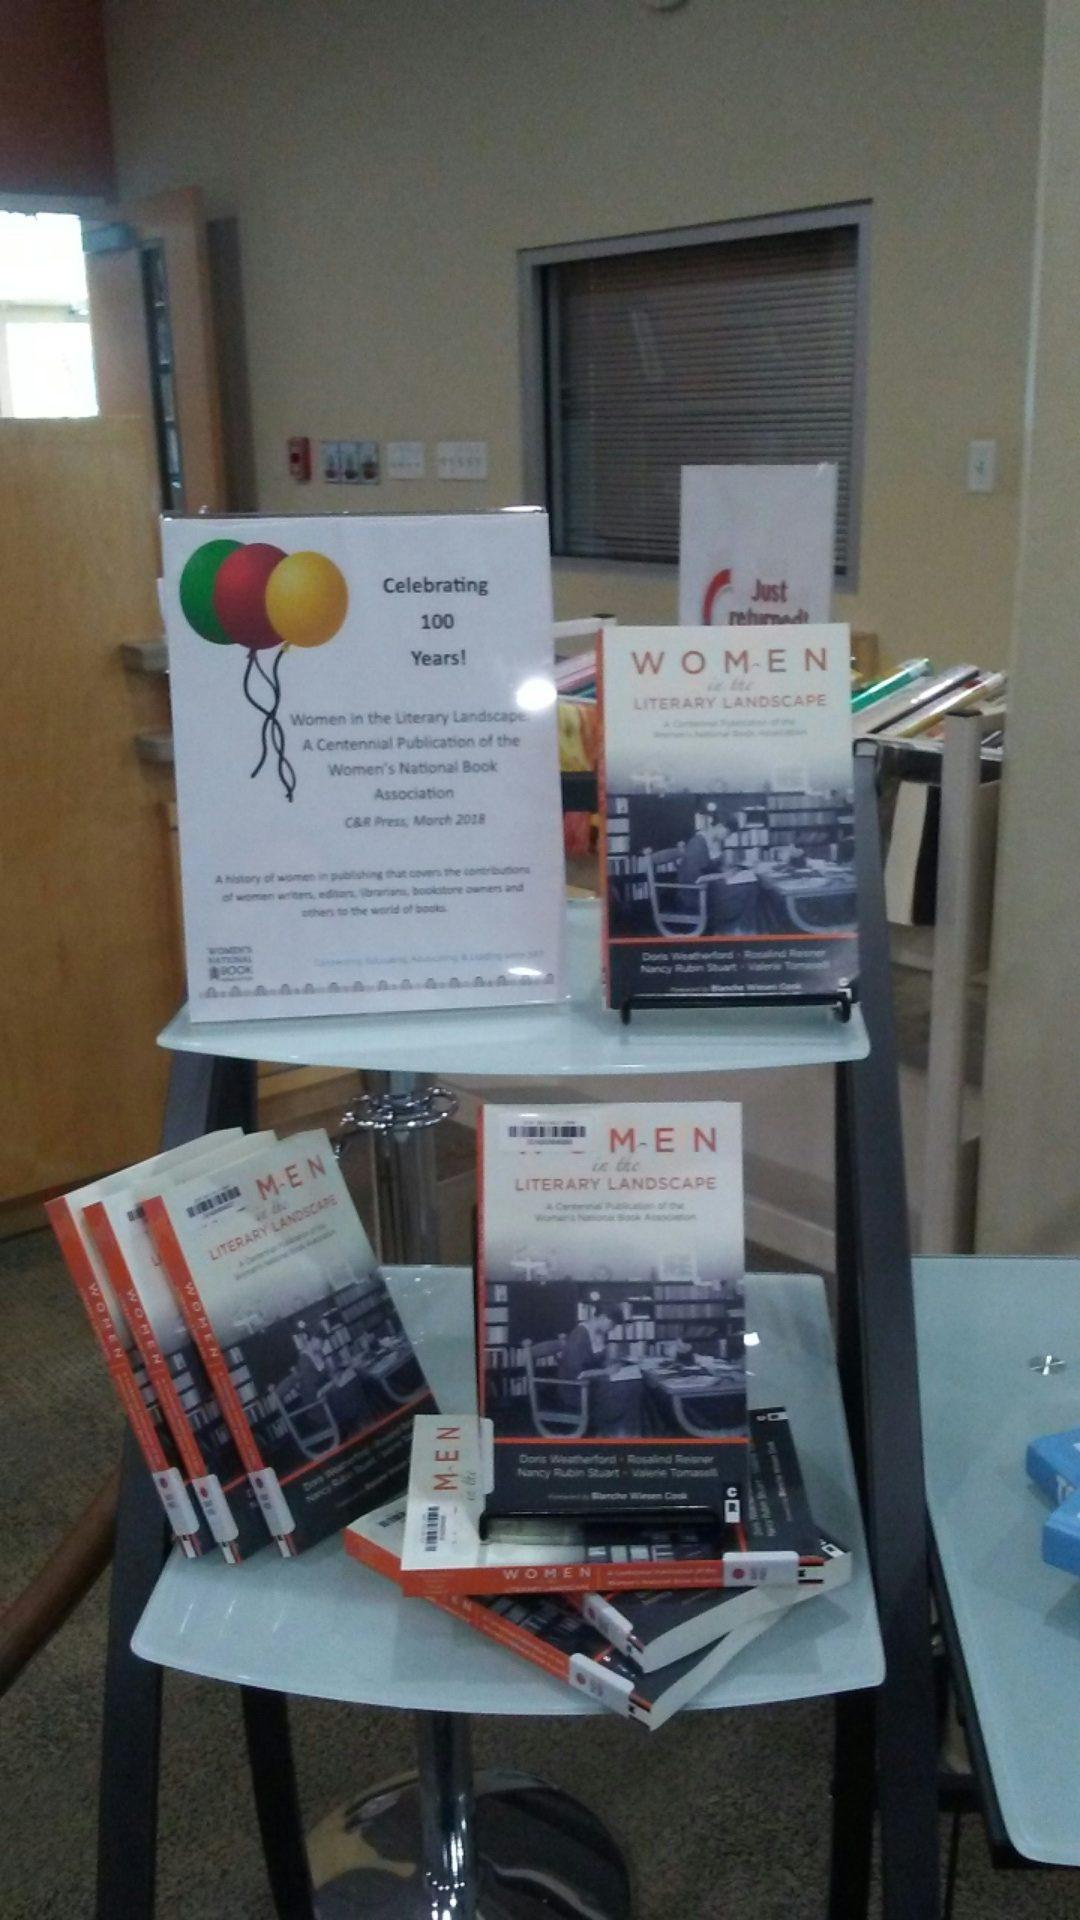 WNBA publication display